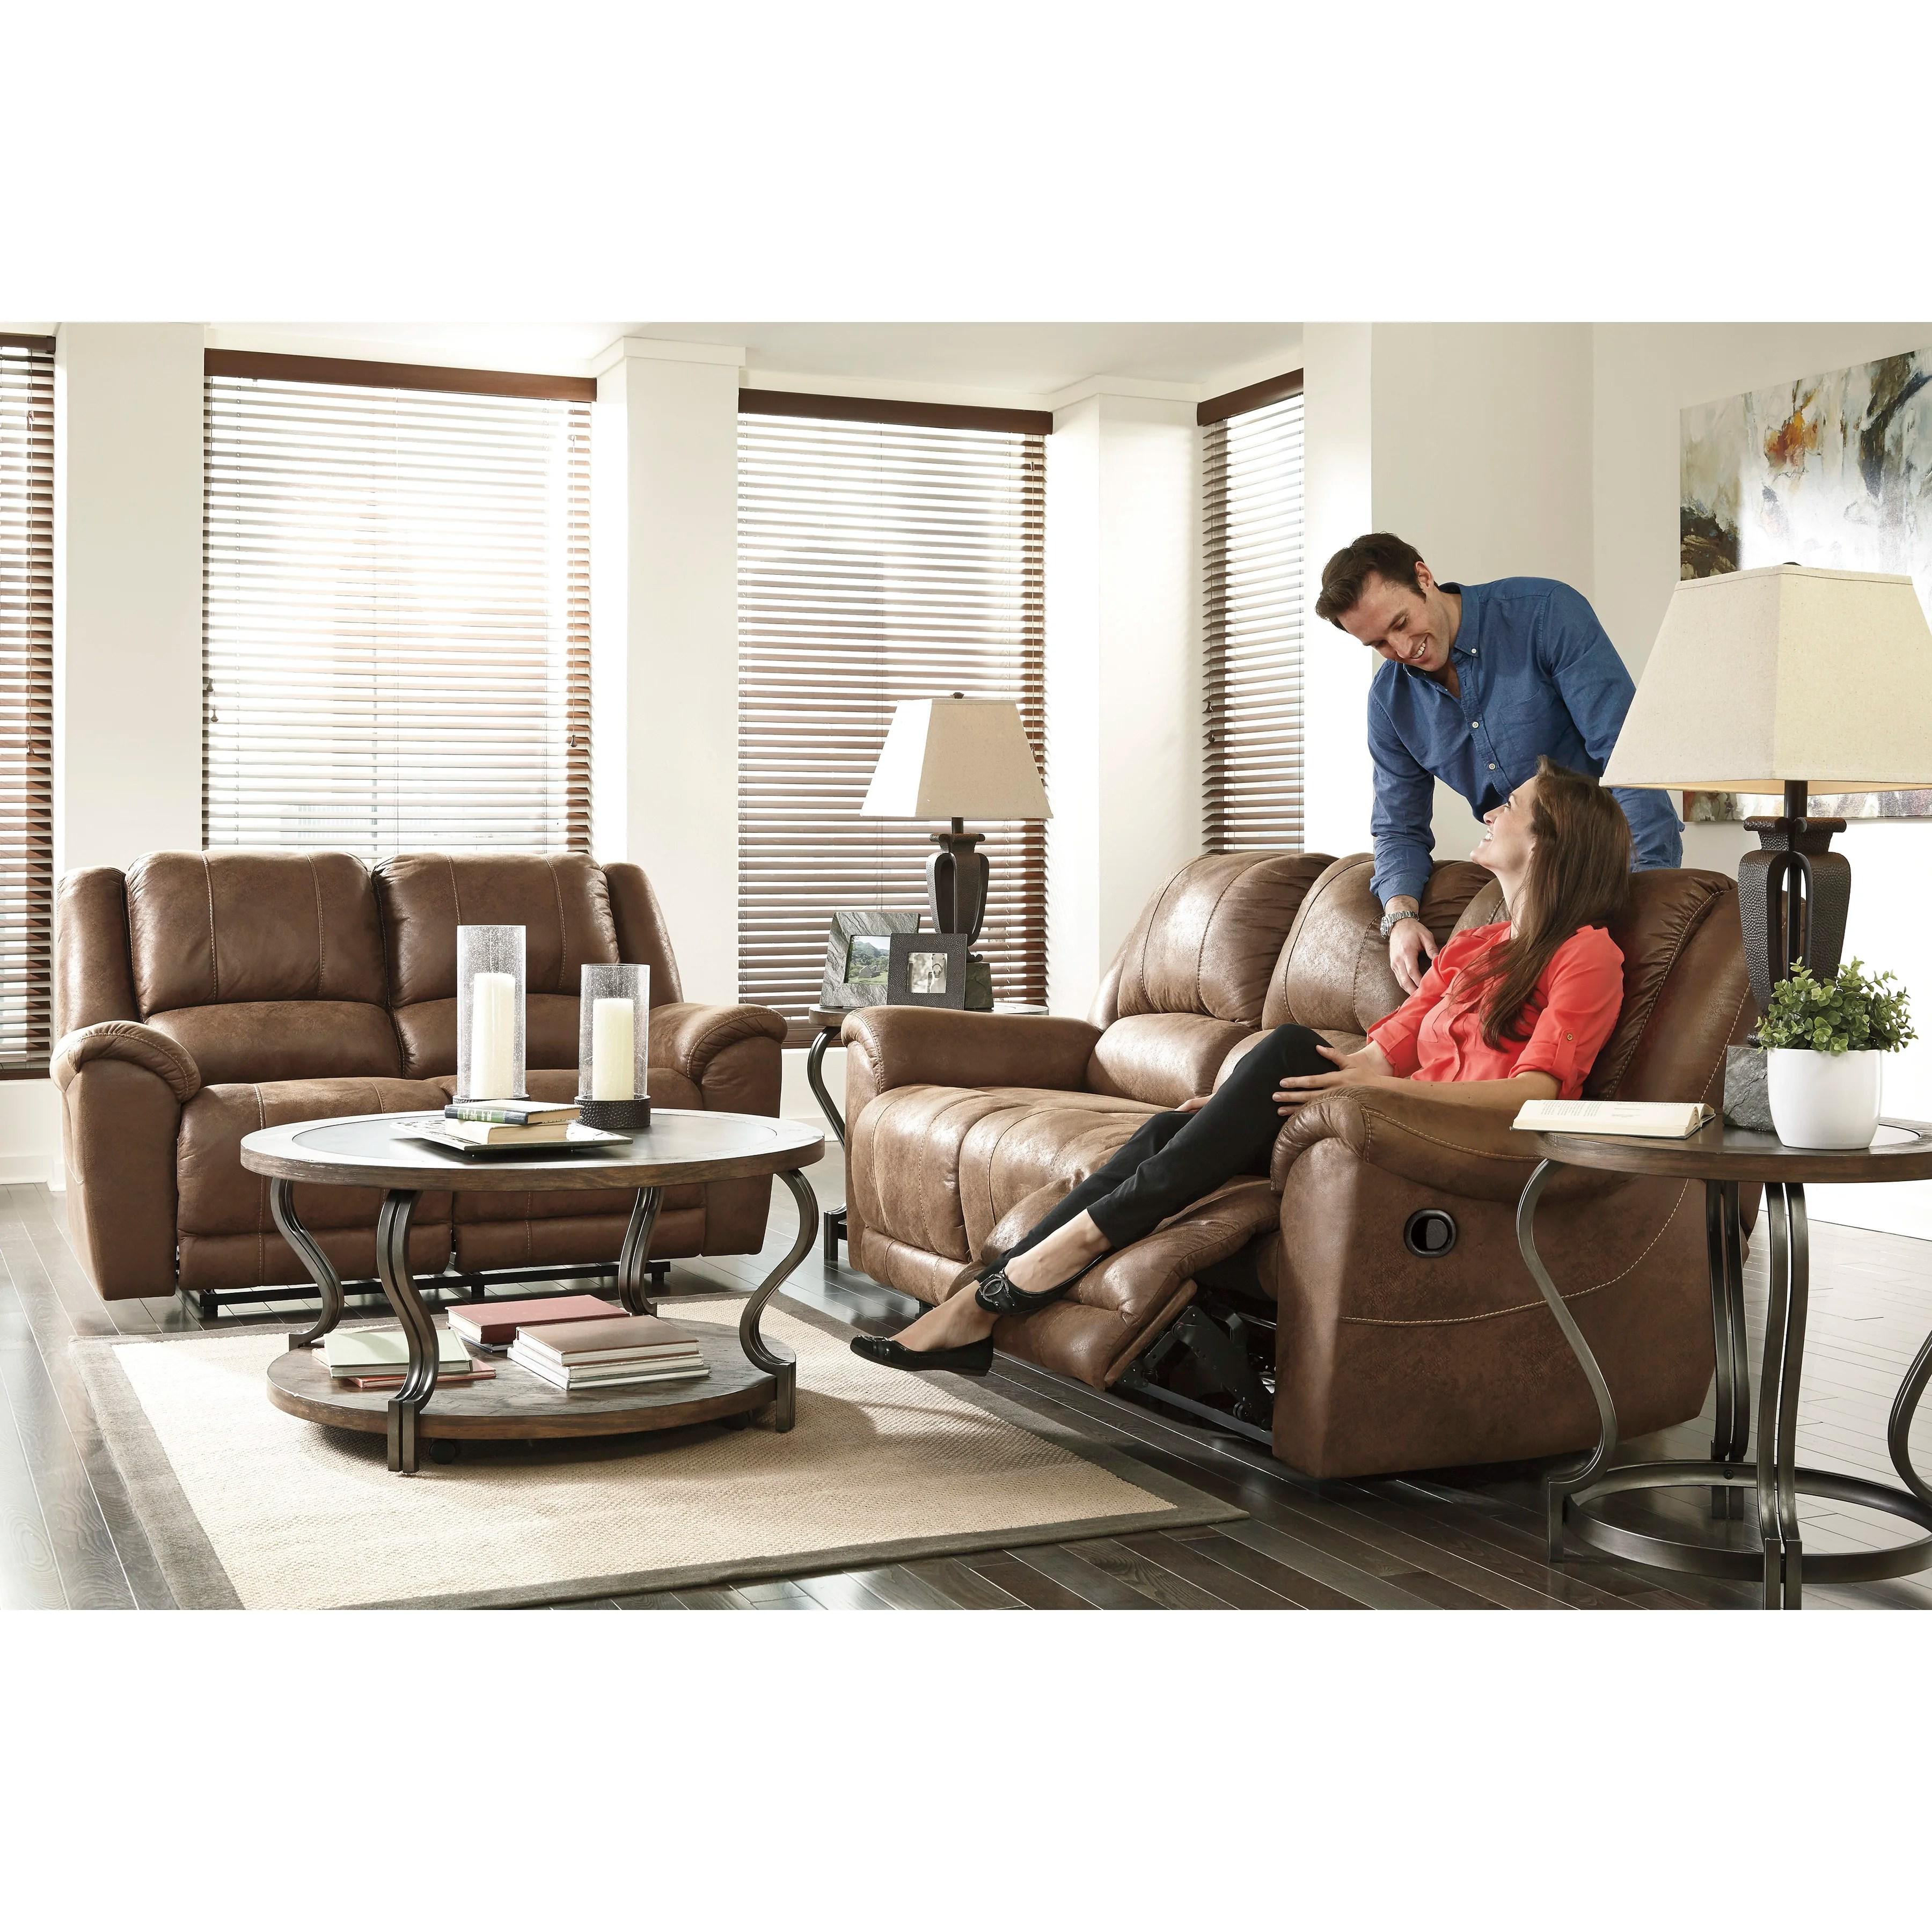 signature design by ashley harvest sleeper sofa best sofas for dogs owners niarobi reclining wayfair